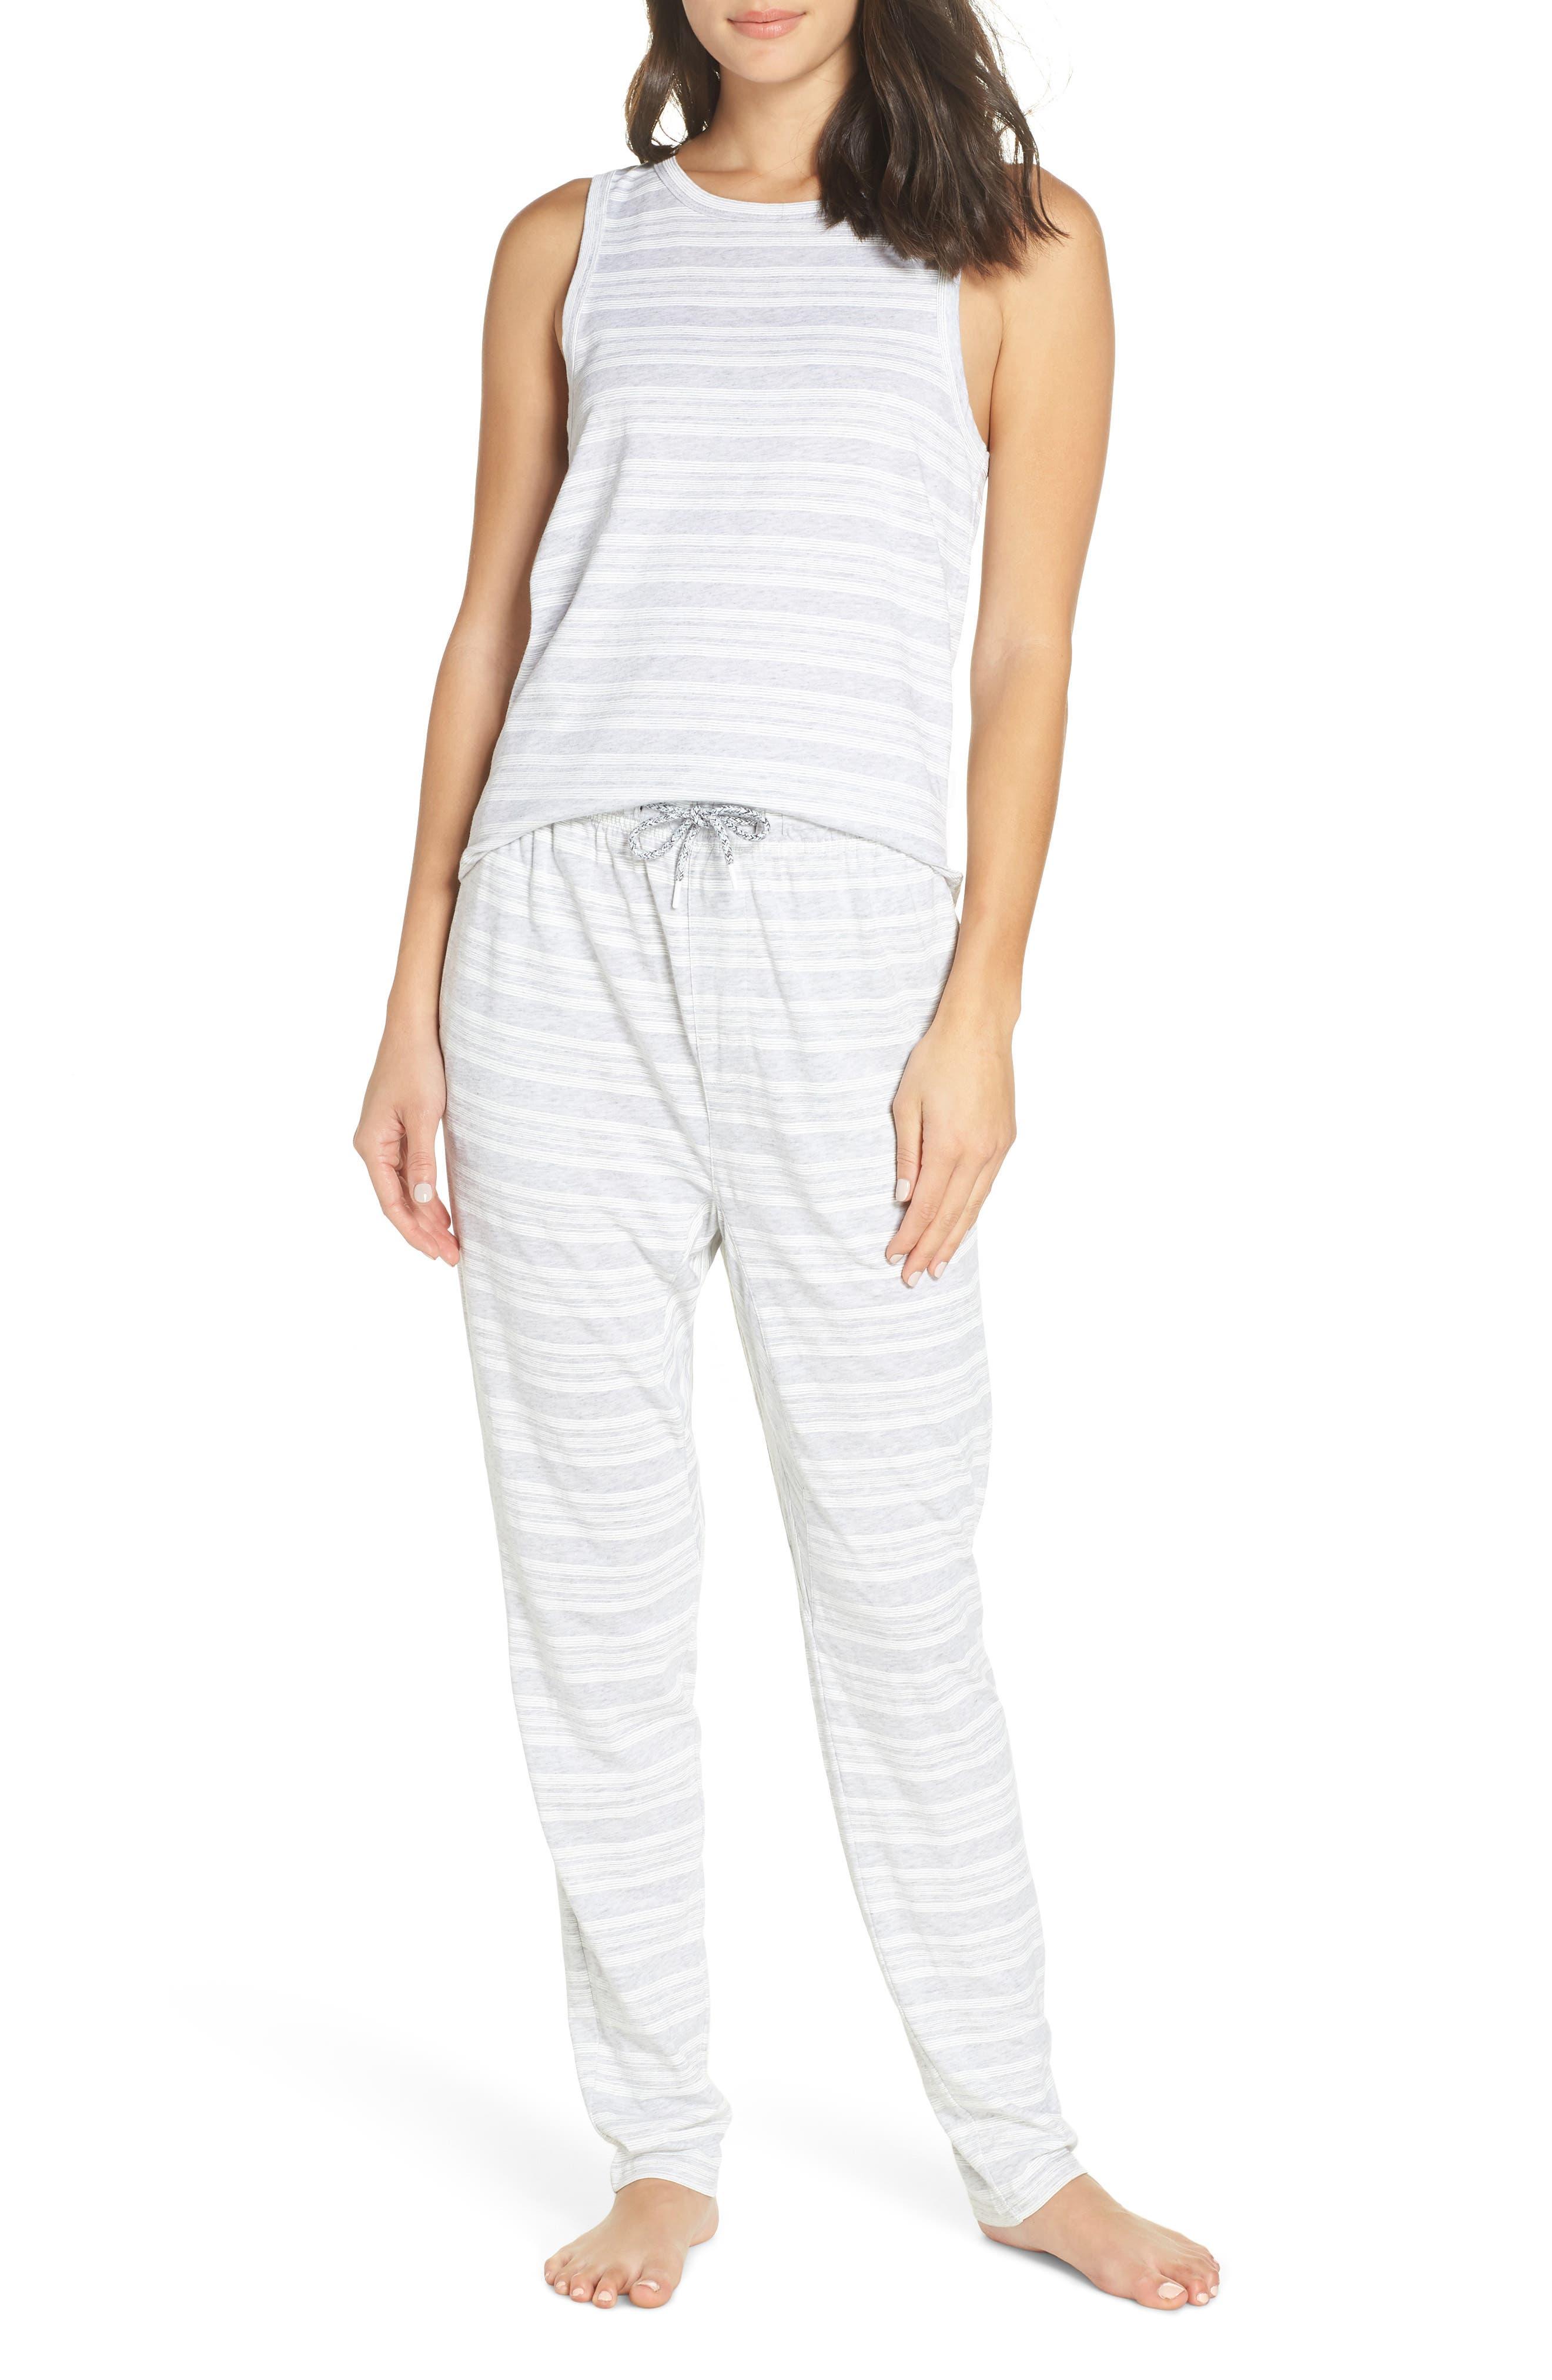 Alice Pajama Pants,                             Alternate thumbnail 7, color,                             LOLLY STRIPE WHITE